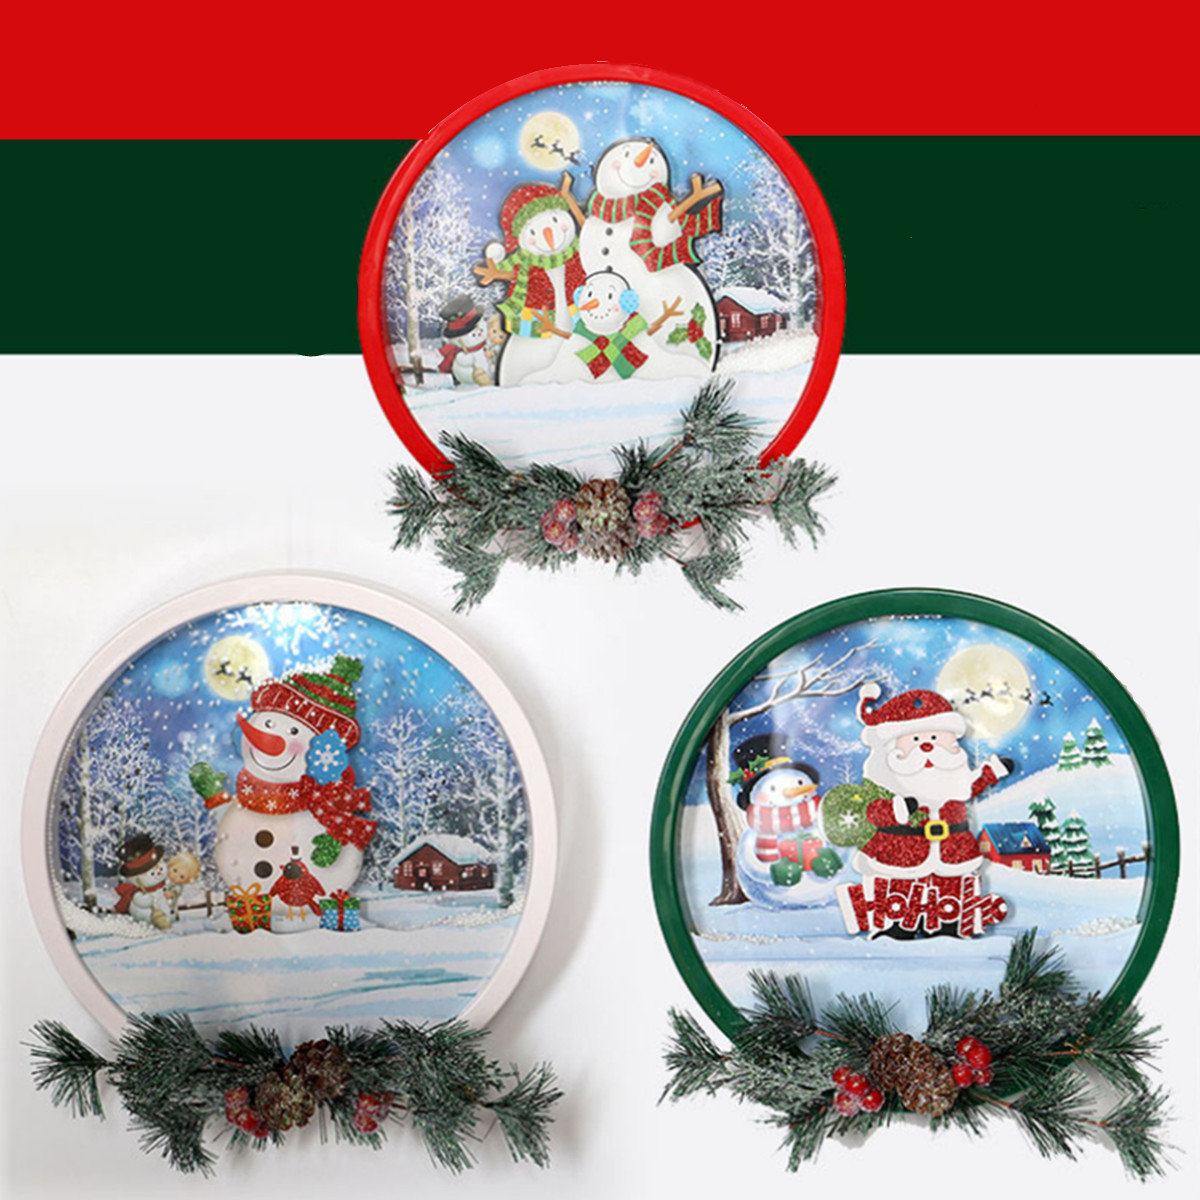 Christmas Santa Claus Snowman Garland with Light&Music Kids Gift Decoration